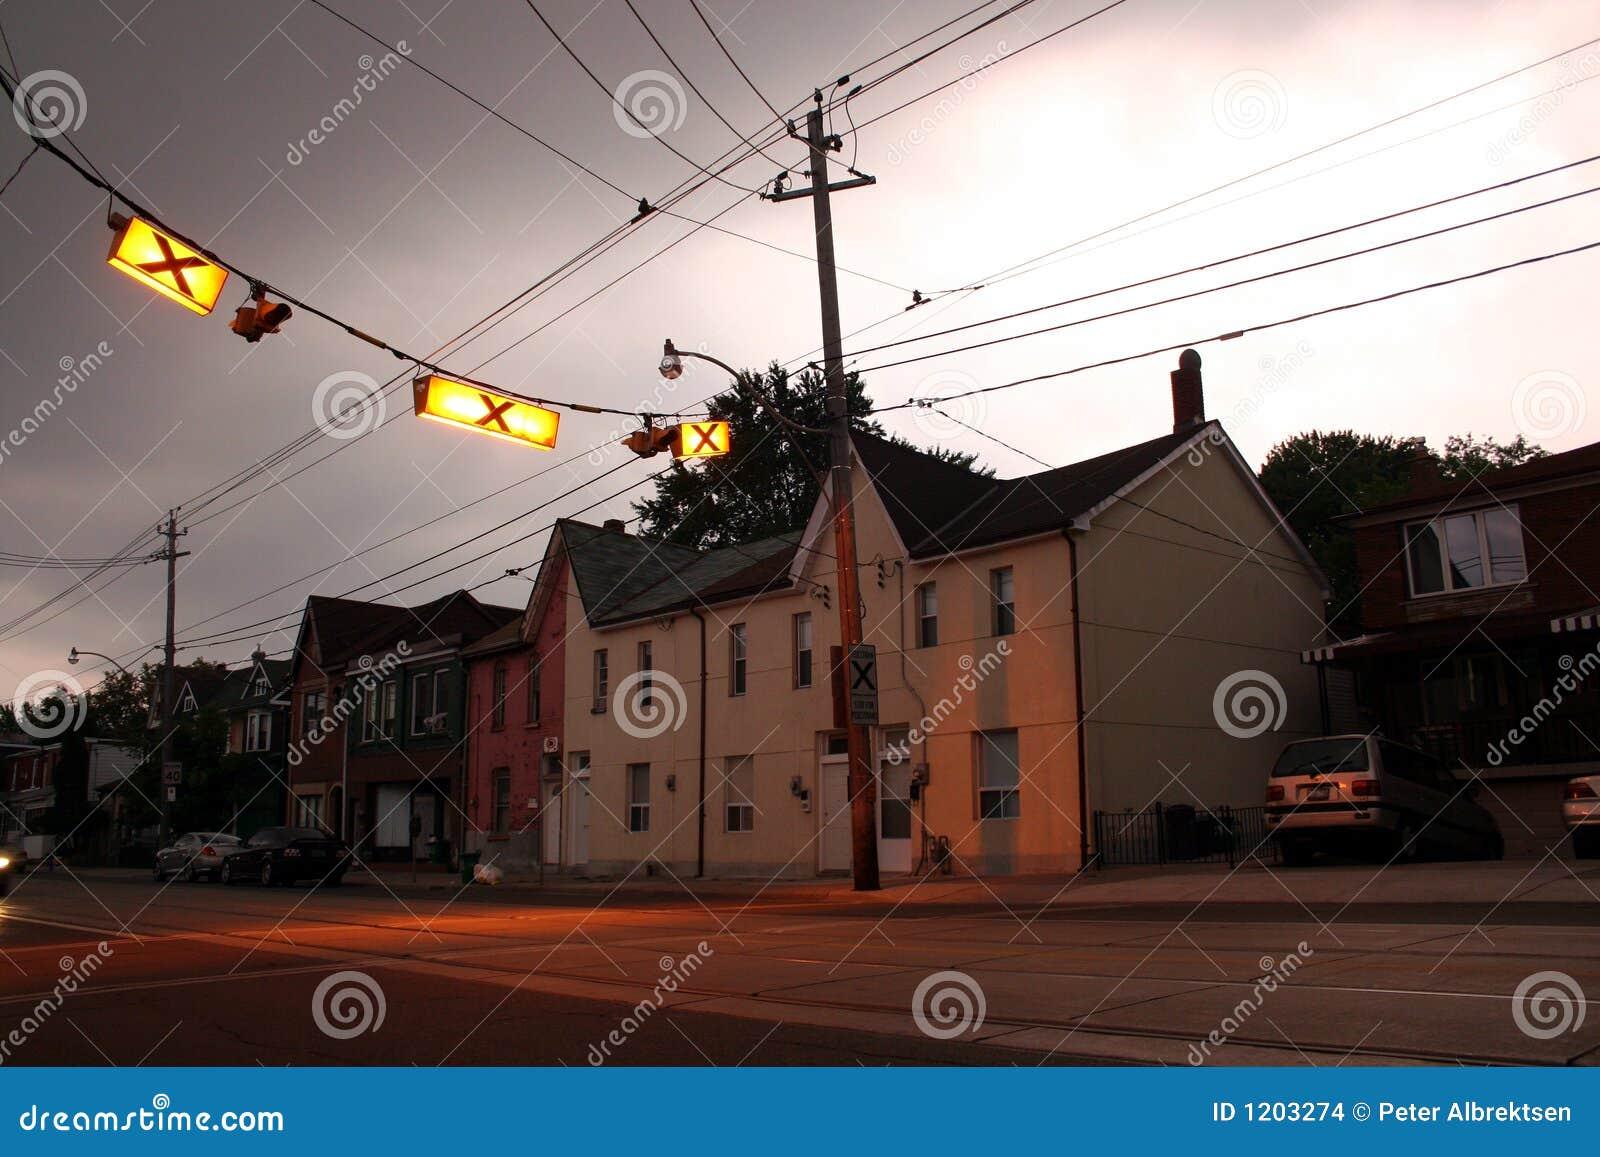 Crosswalk with homes